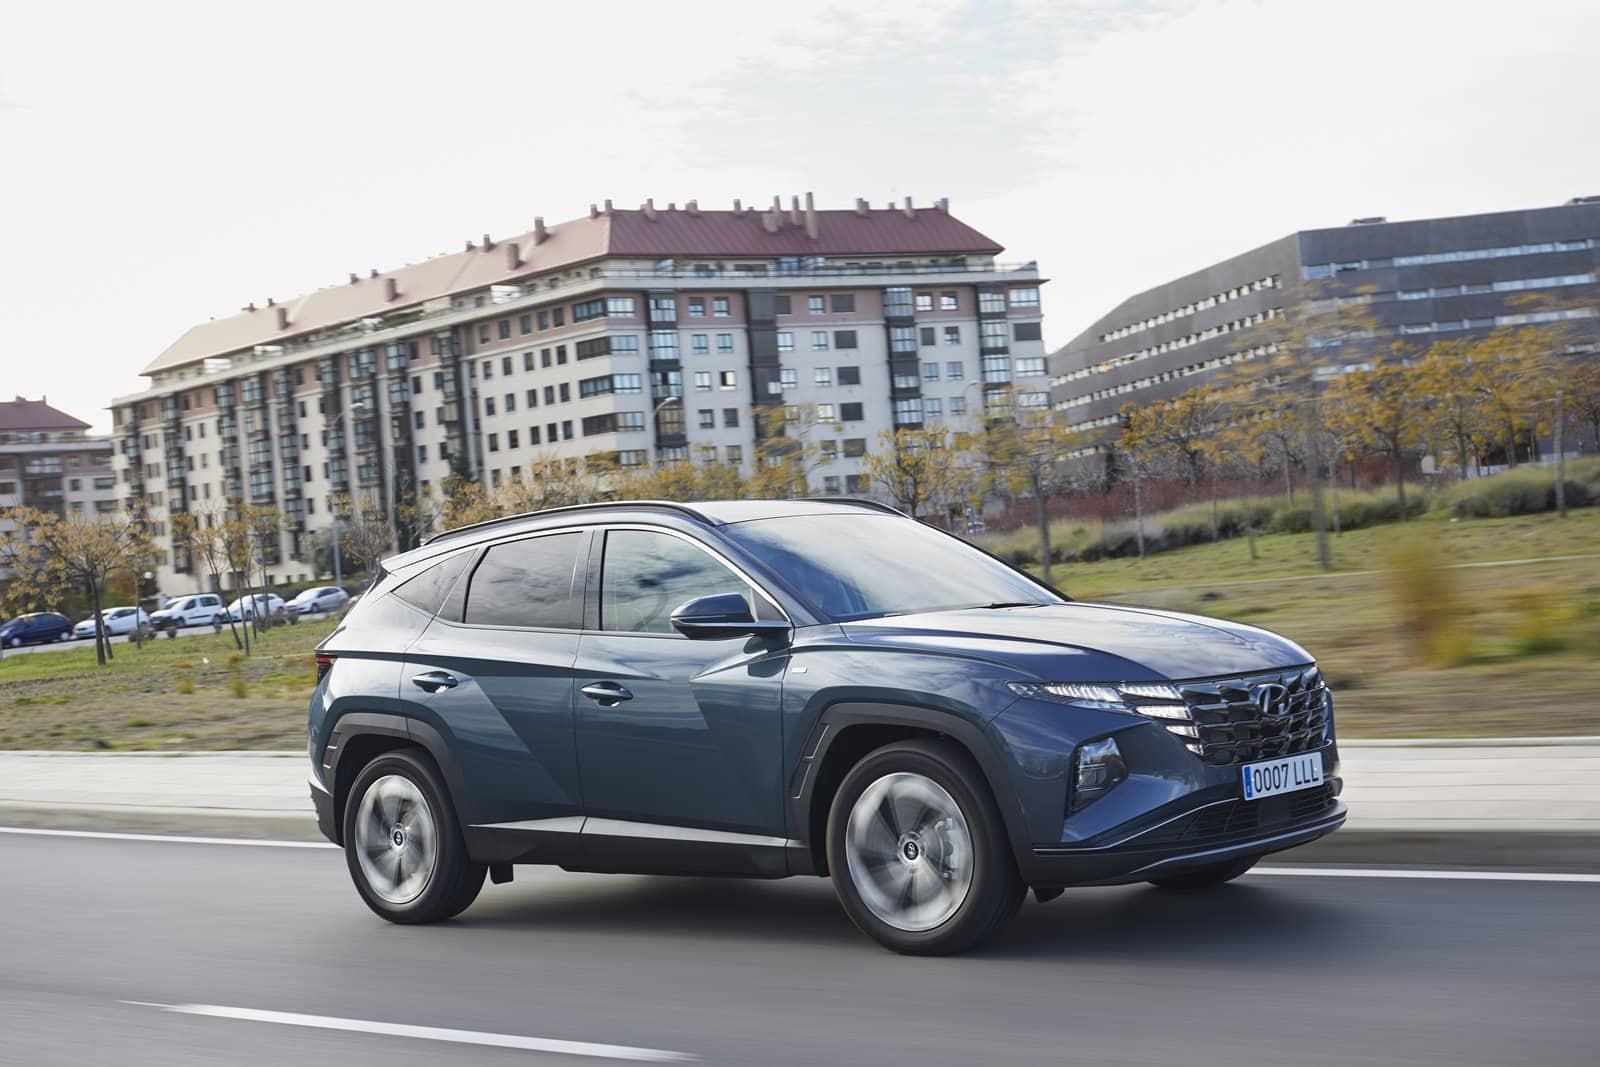 Sales January 2021, Spain: Disastrous start